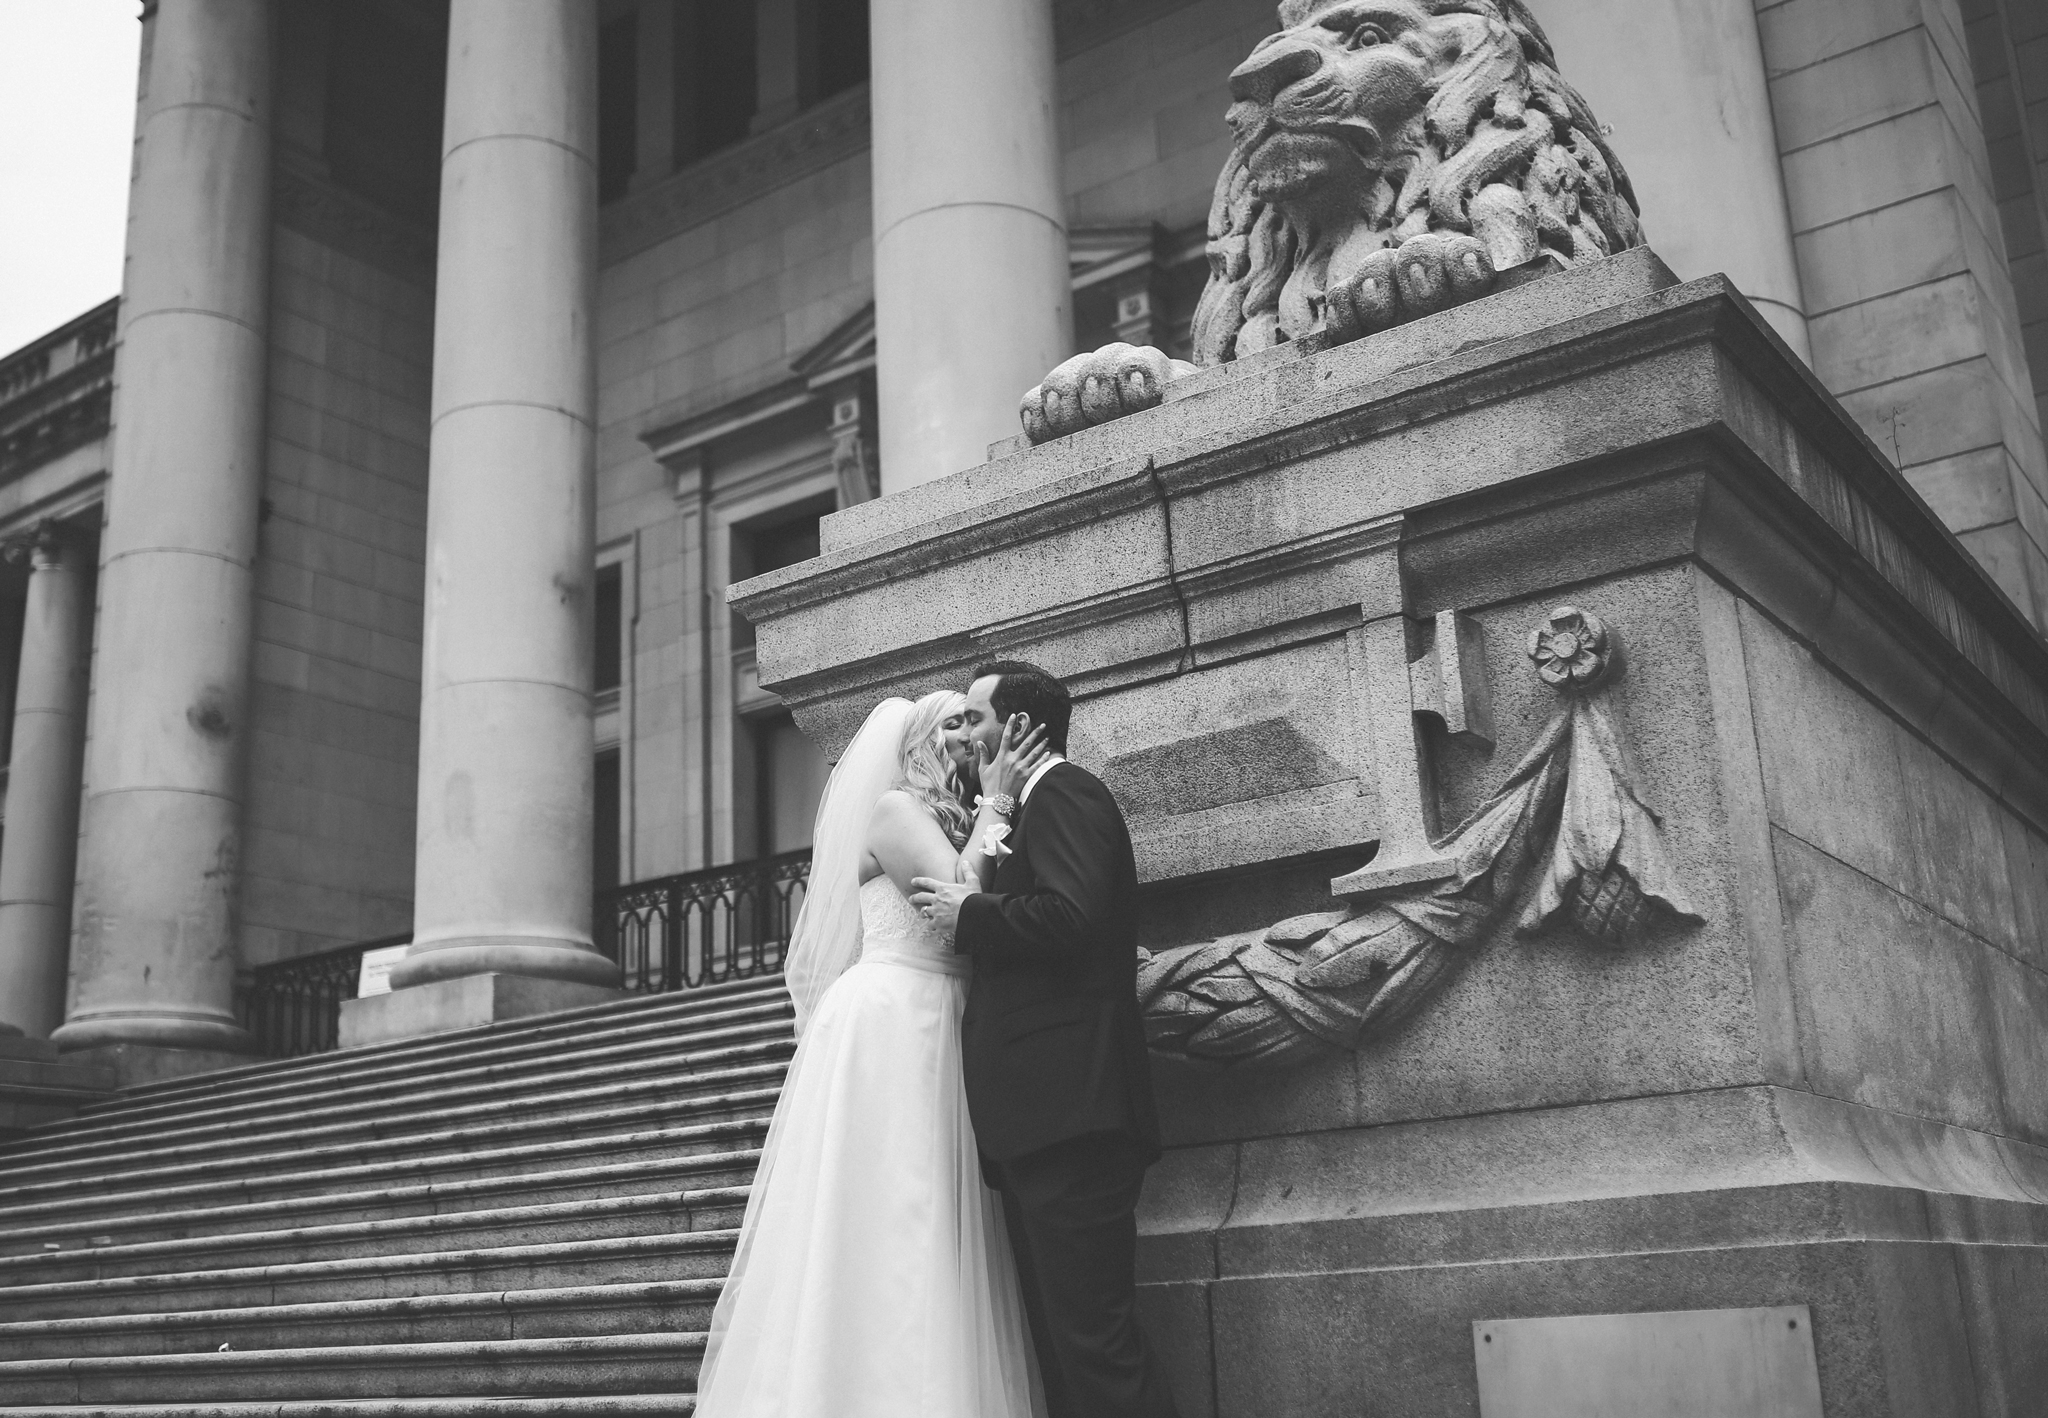 IMG_7500-2-VANCOUVER-WEDDING-PHOTOGRAPHER-JENNIFER-PICARD-PHOTOGRAPHY.jpg